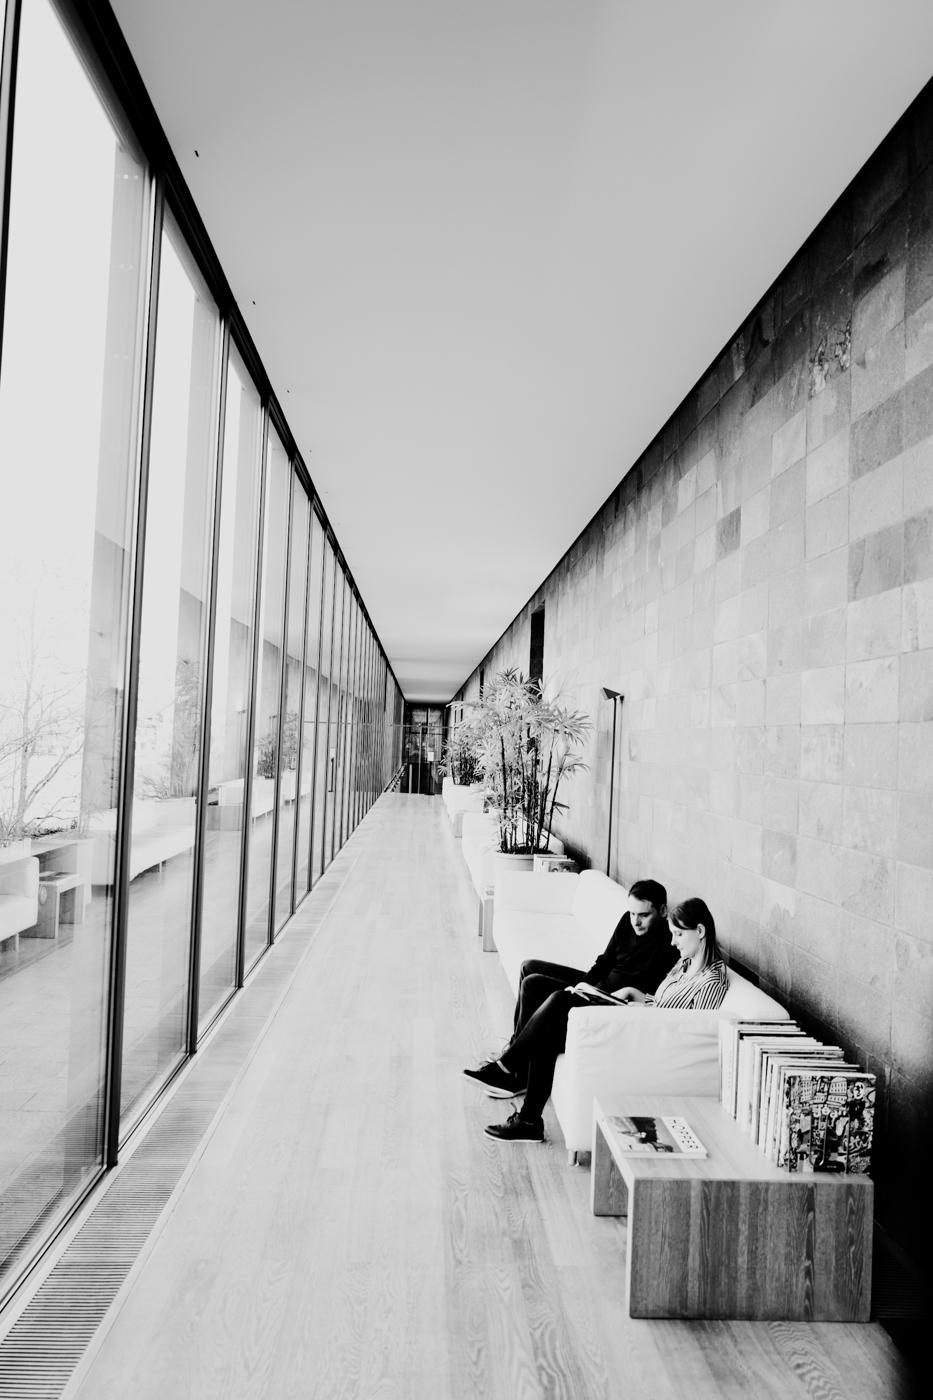 street photography basel leica Q